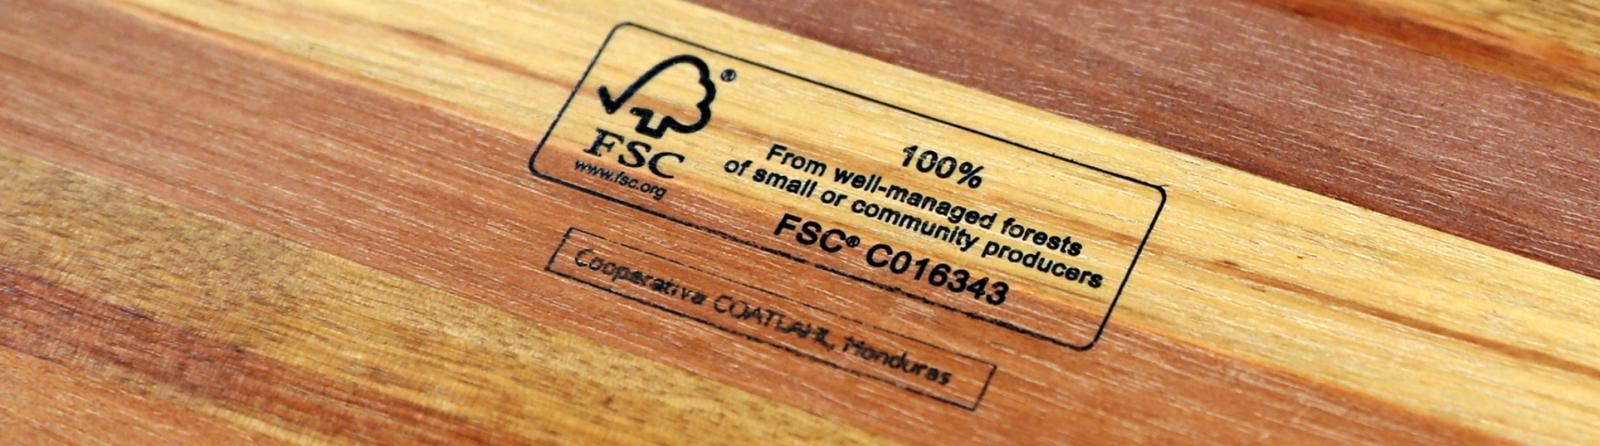 Becoming Fsc Certified 183 Fsc International